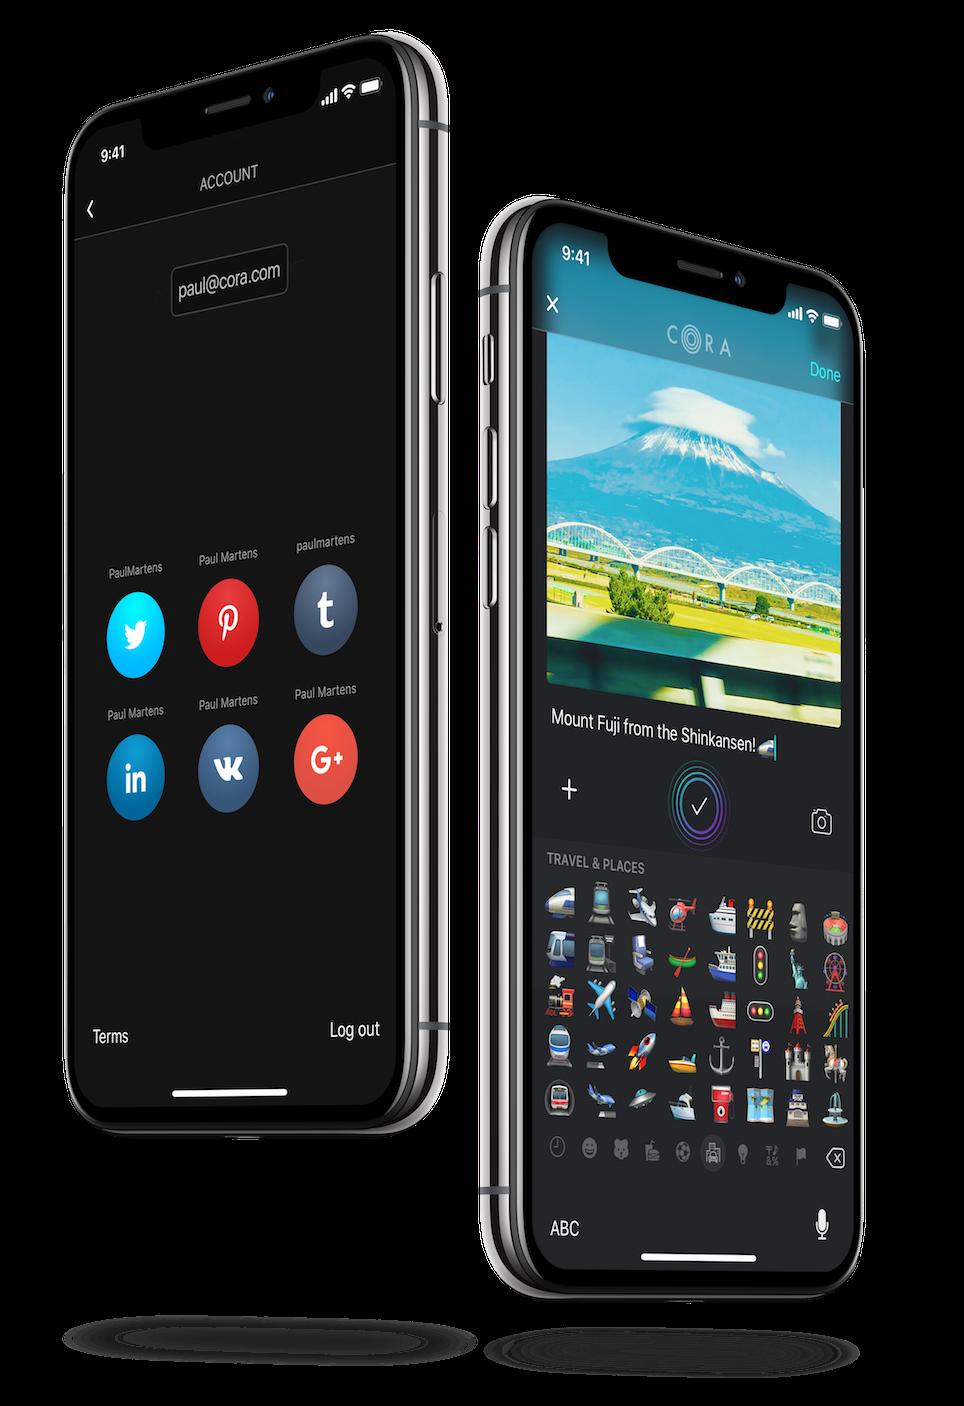 Screenshot of Emoji use in App